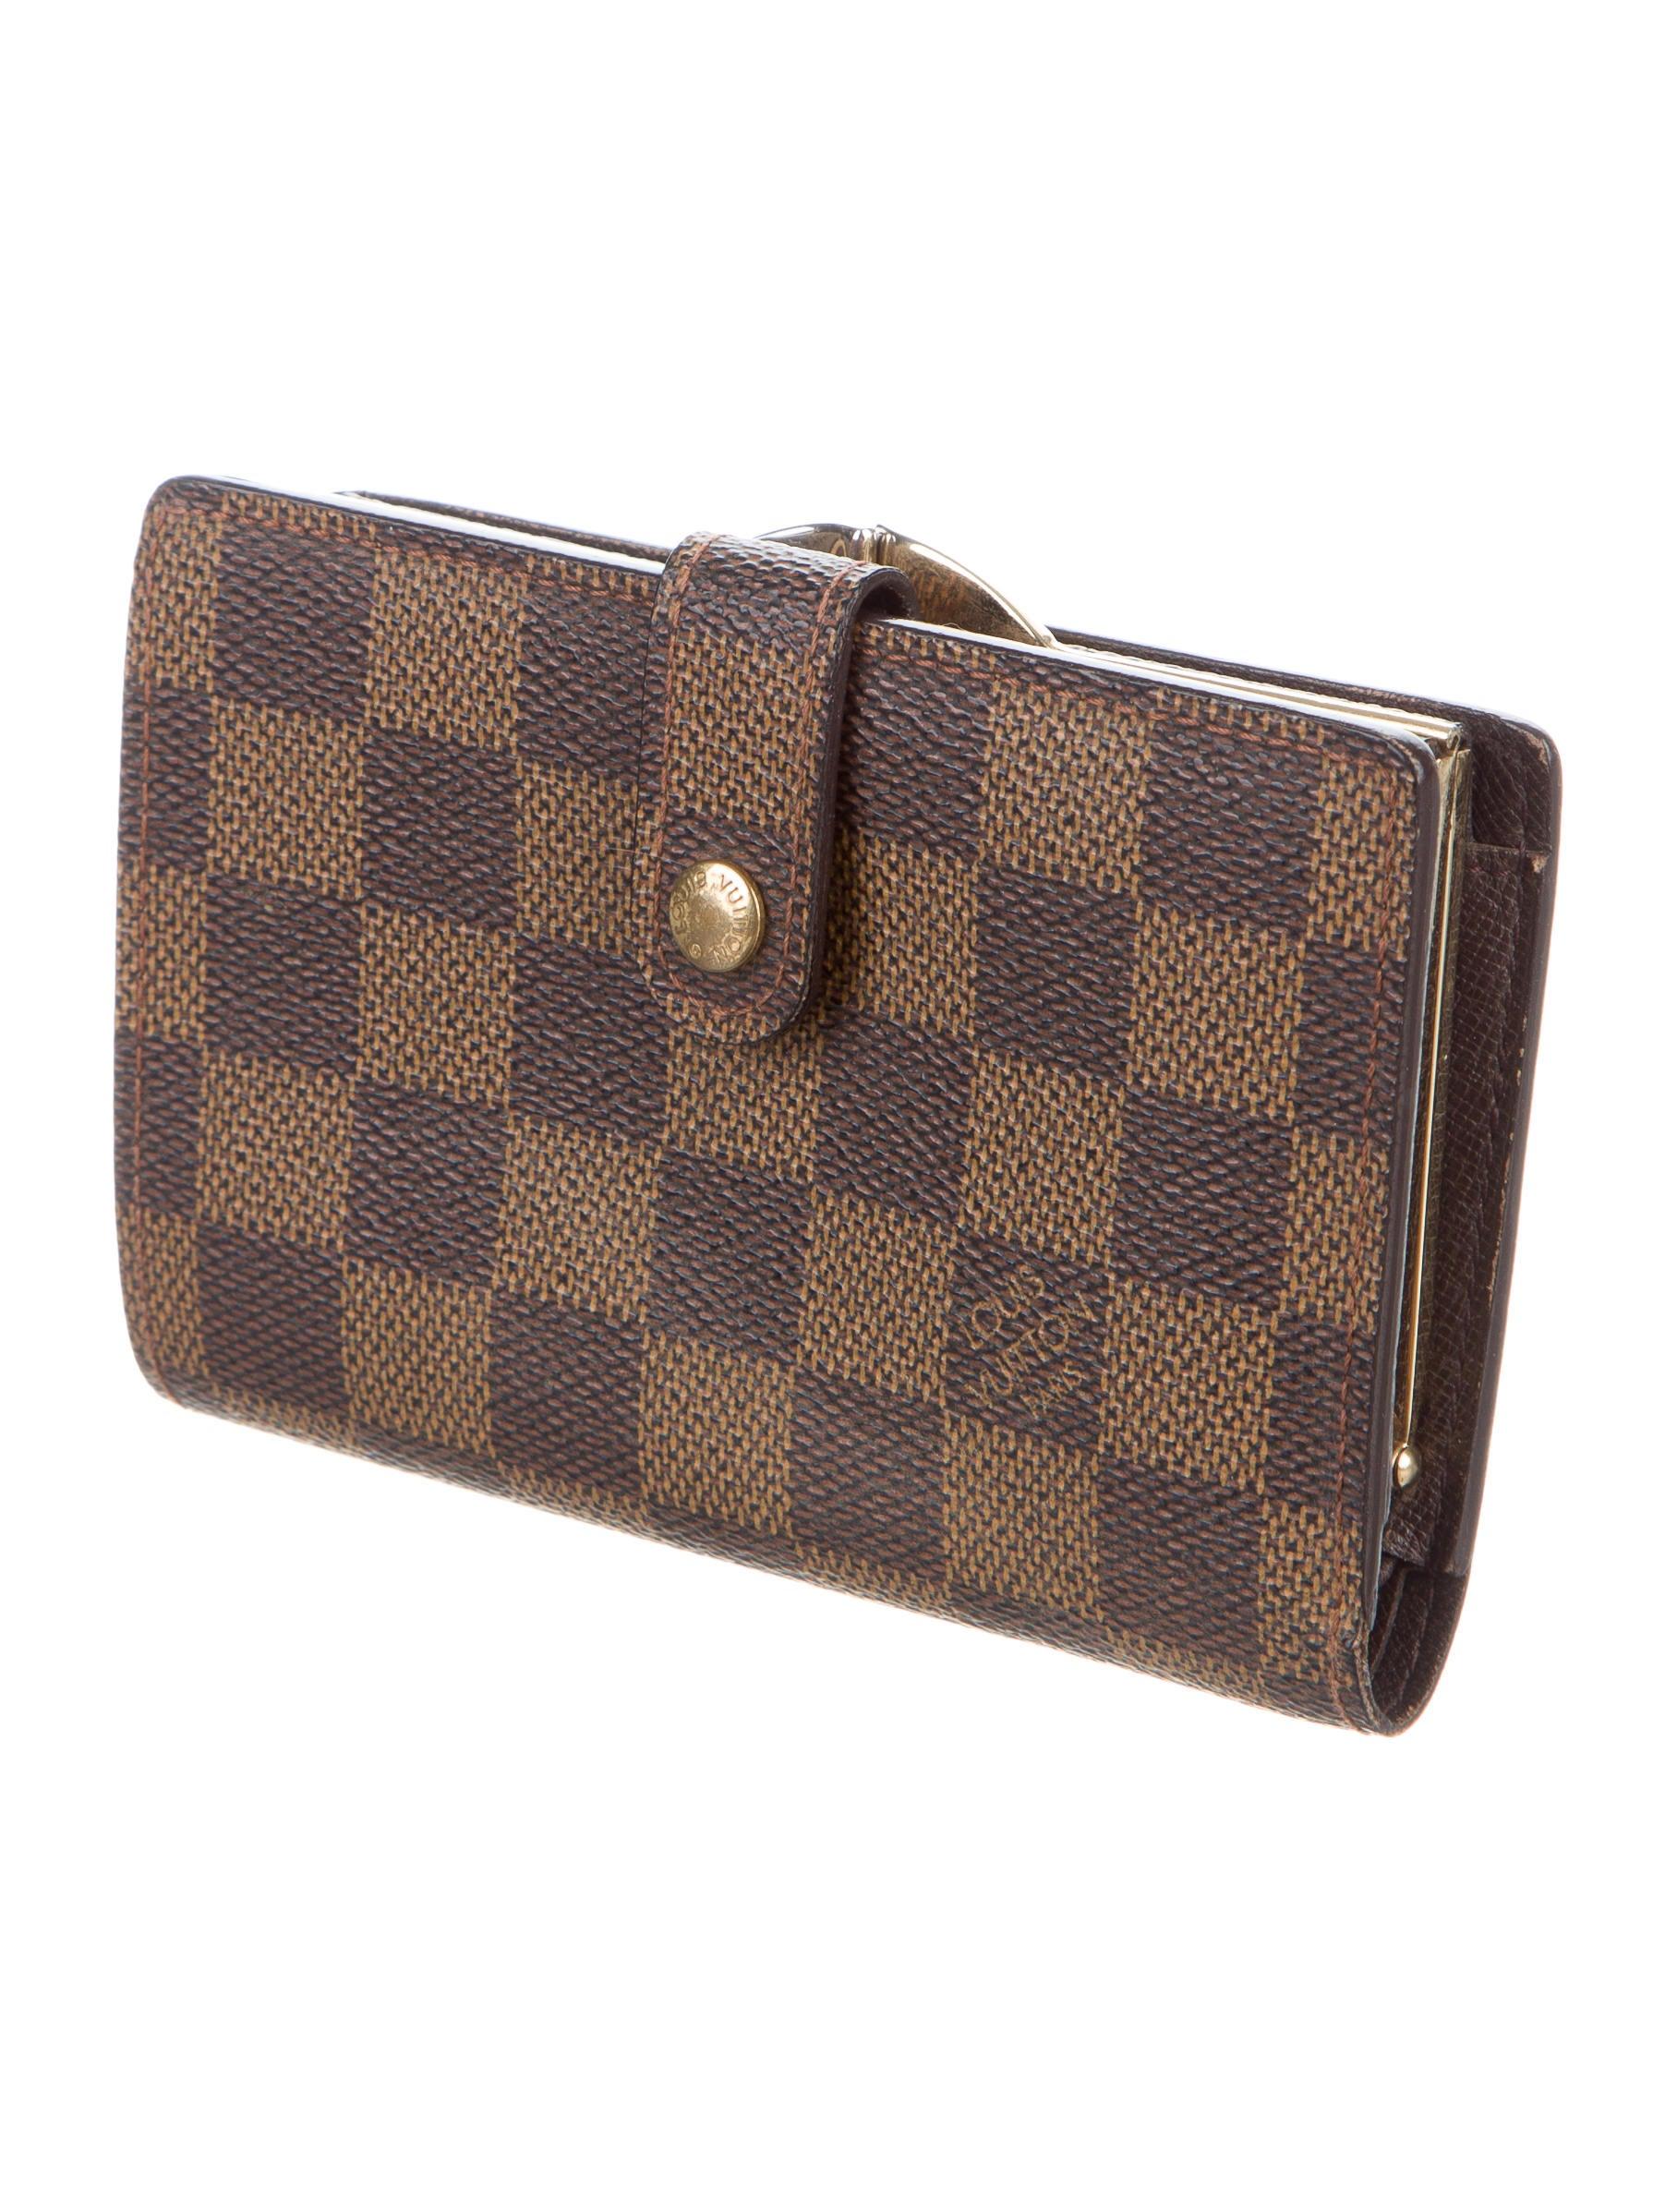 Louis Vuitton Damier Ebene French Purse Wallet - Accessories ... f0741ecd1b